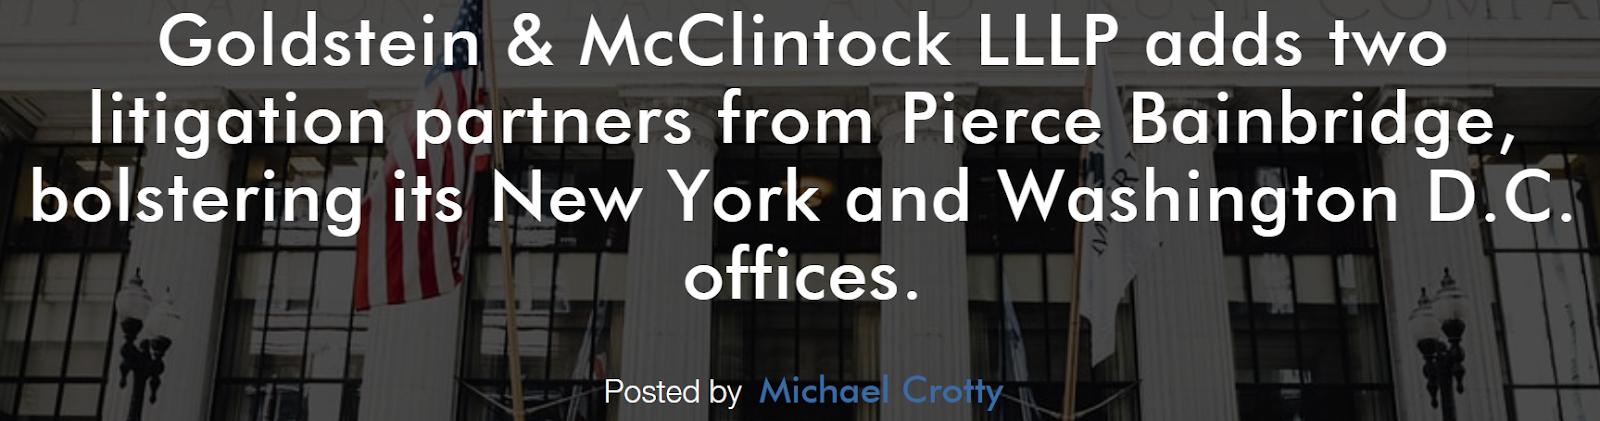 Breaking News:  Ex-Pierce Bainbridge General Counsel is Now at Goldstein & McClintock 9